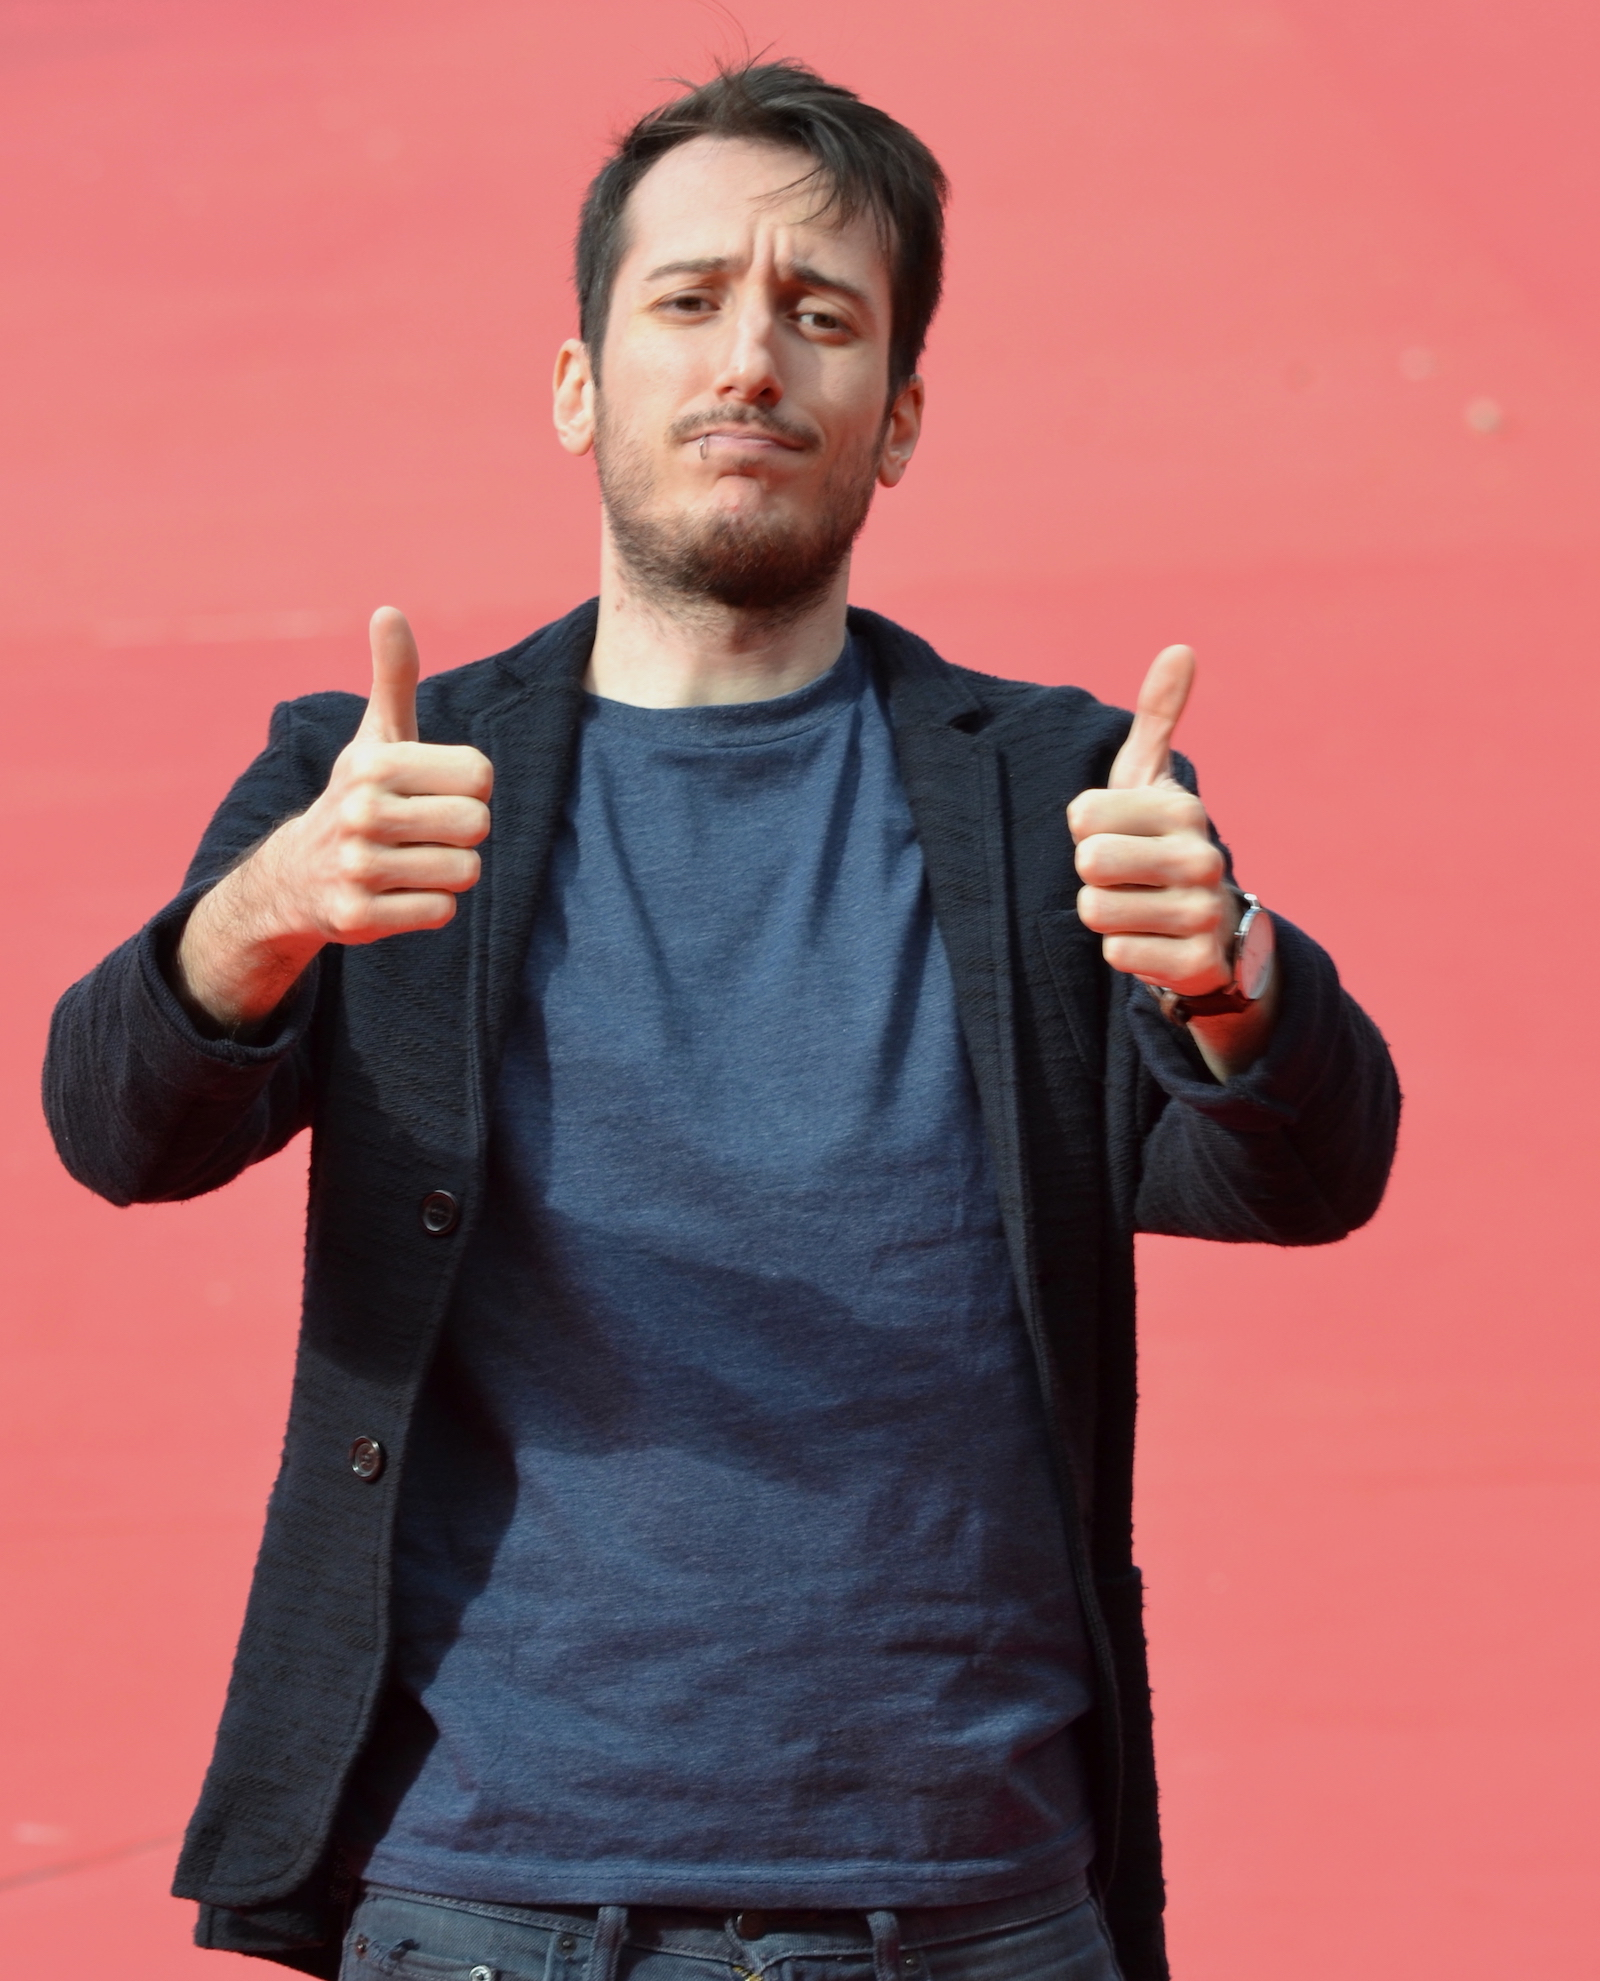 Roma 2015: Luca Denaro sul red carpet di Inside Out